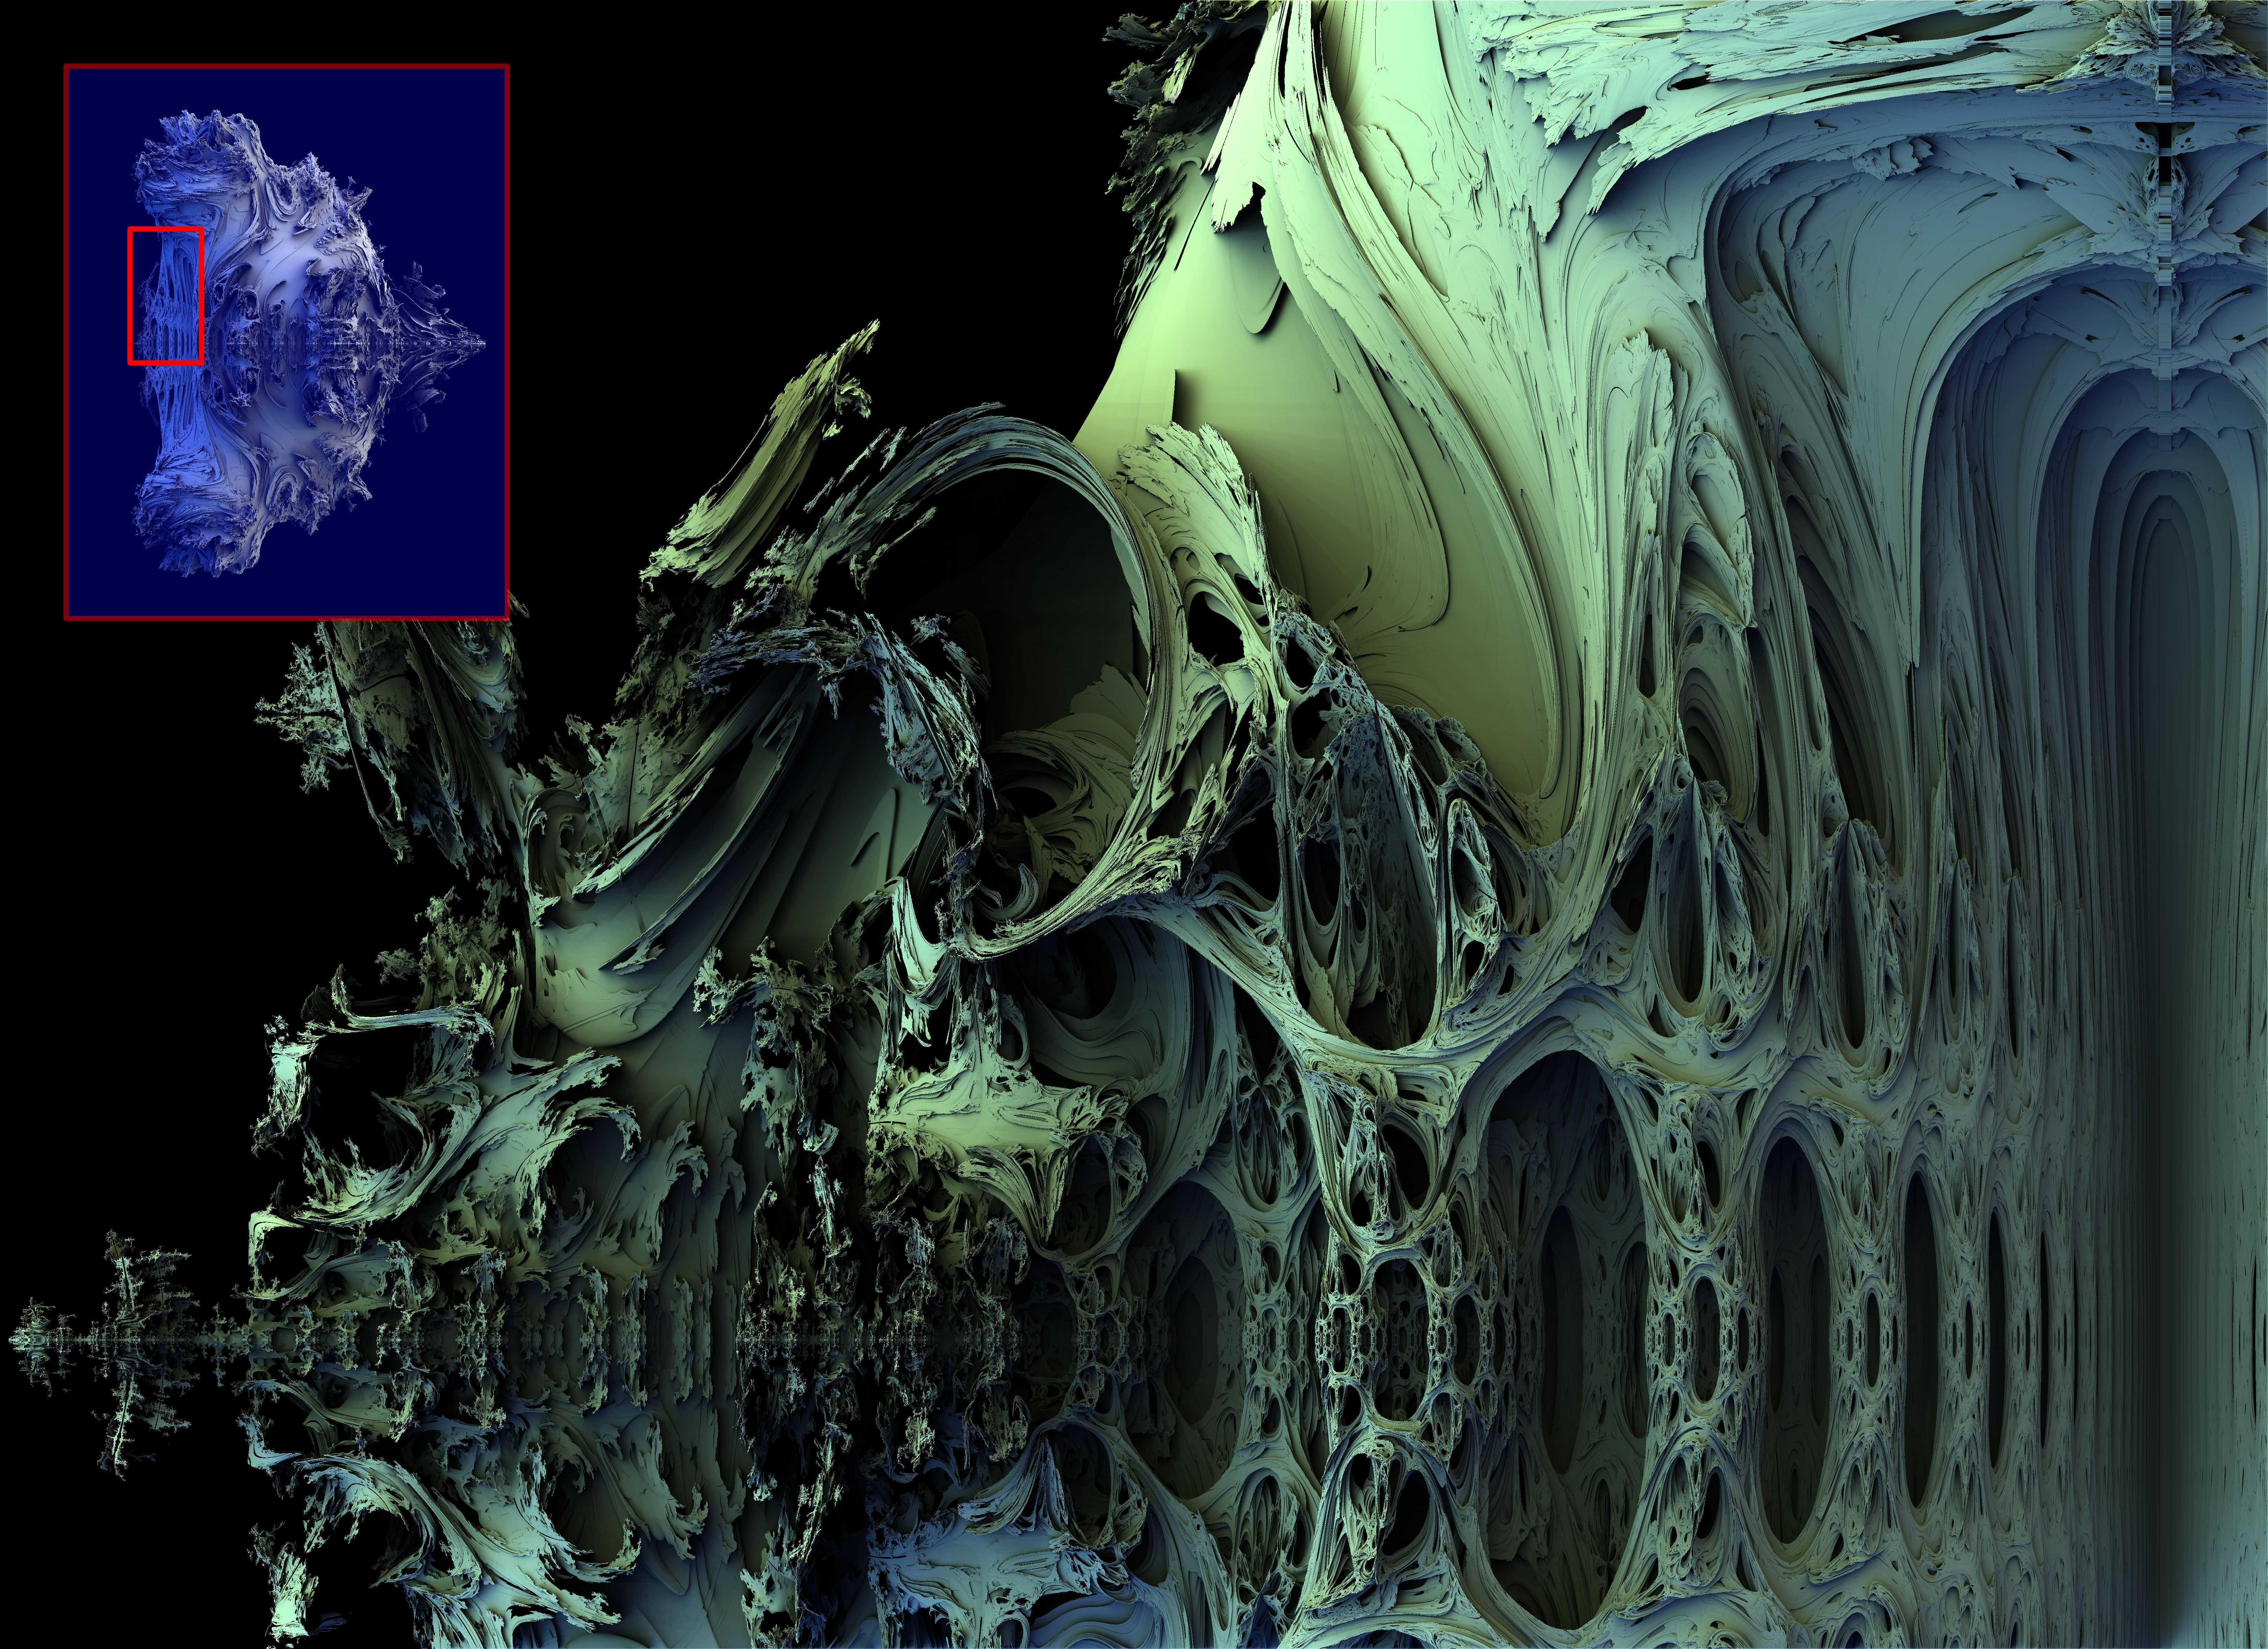 Amazing Fractal Art